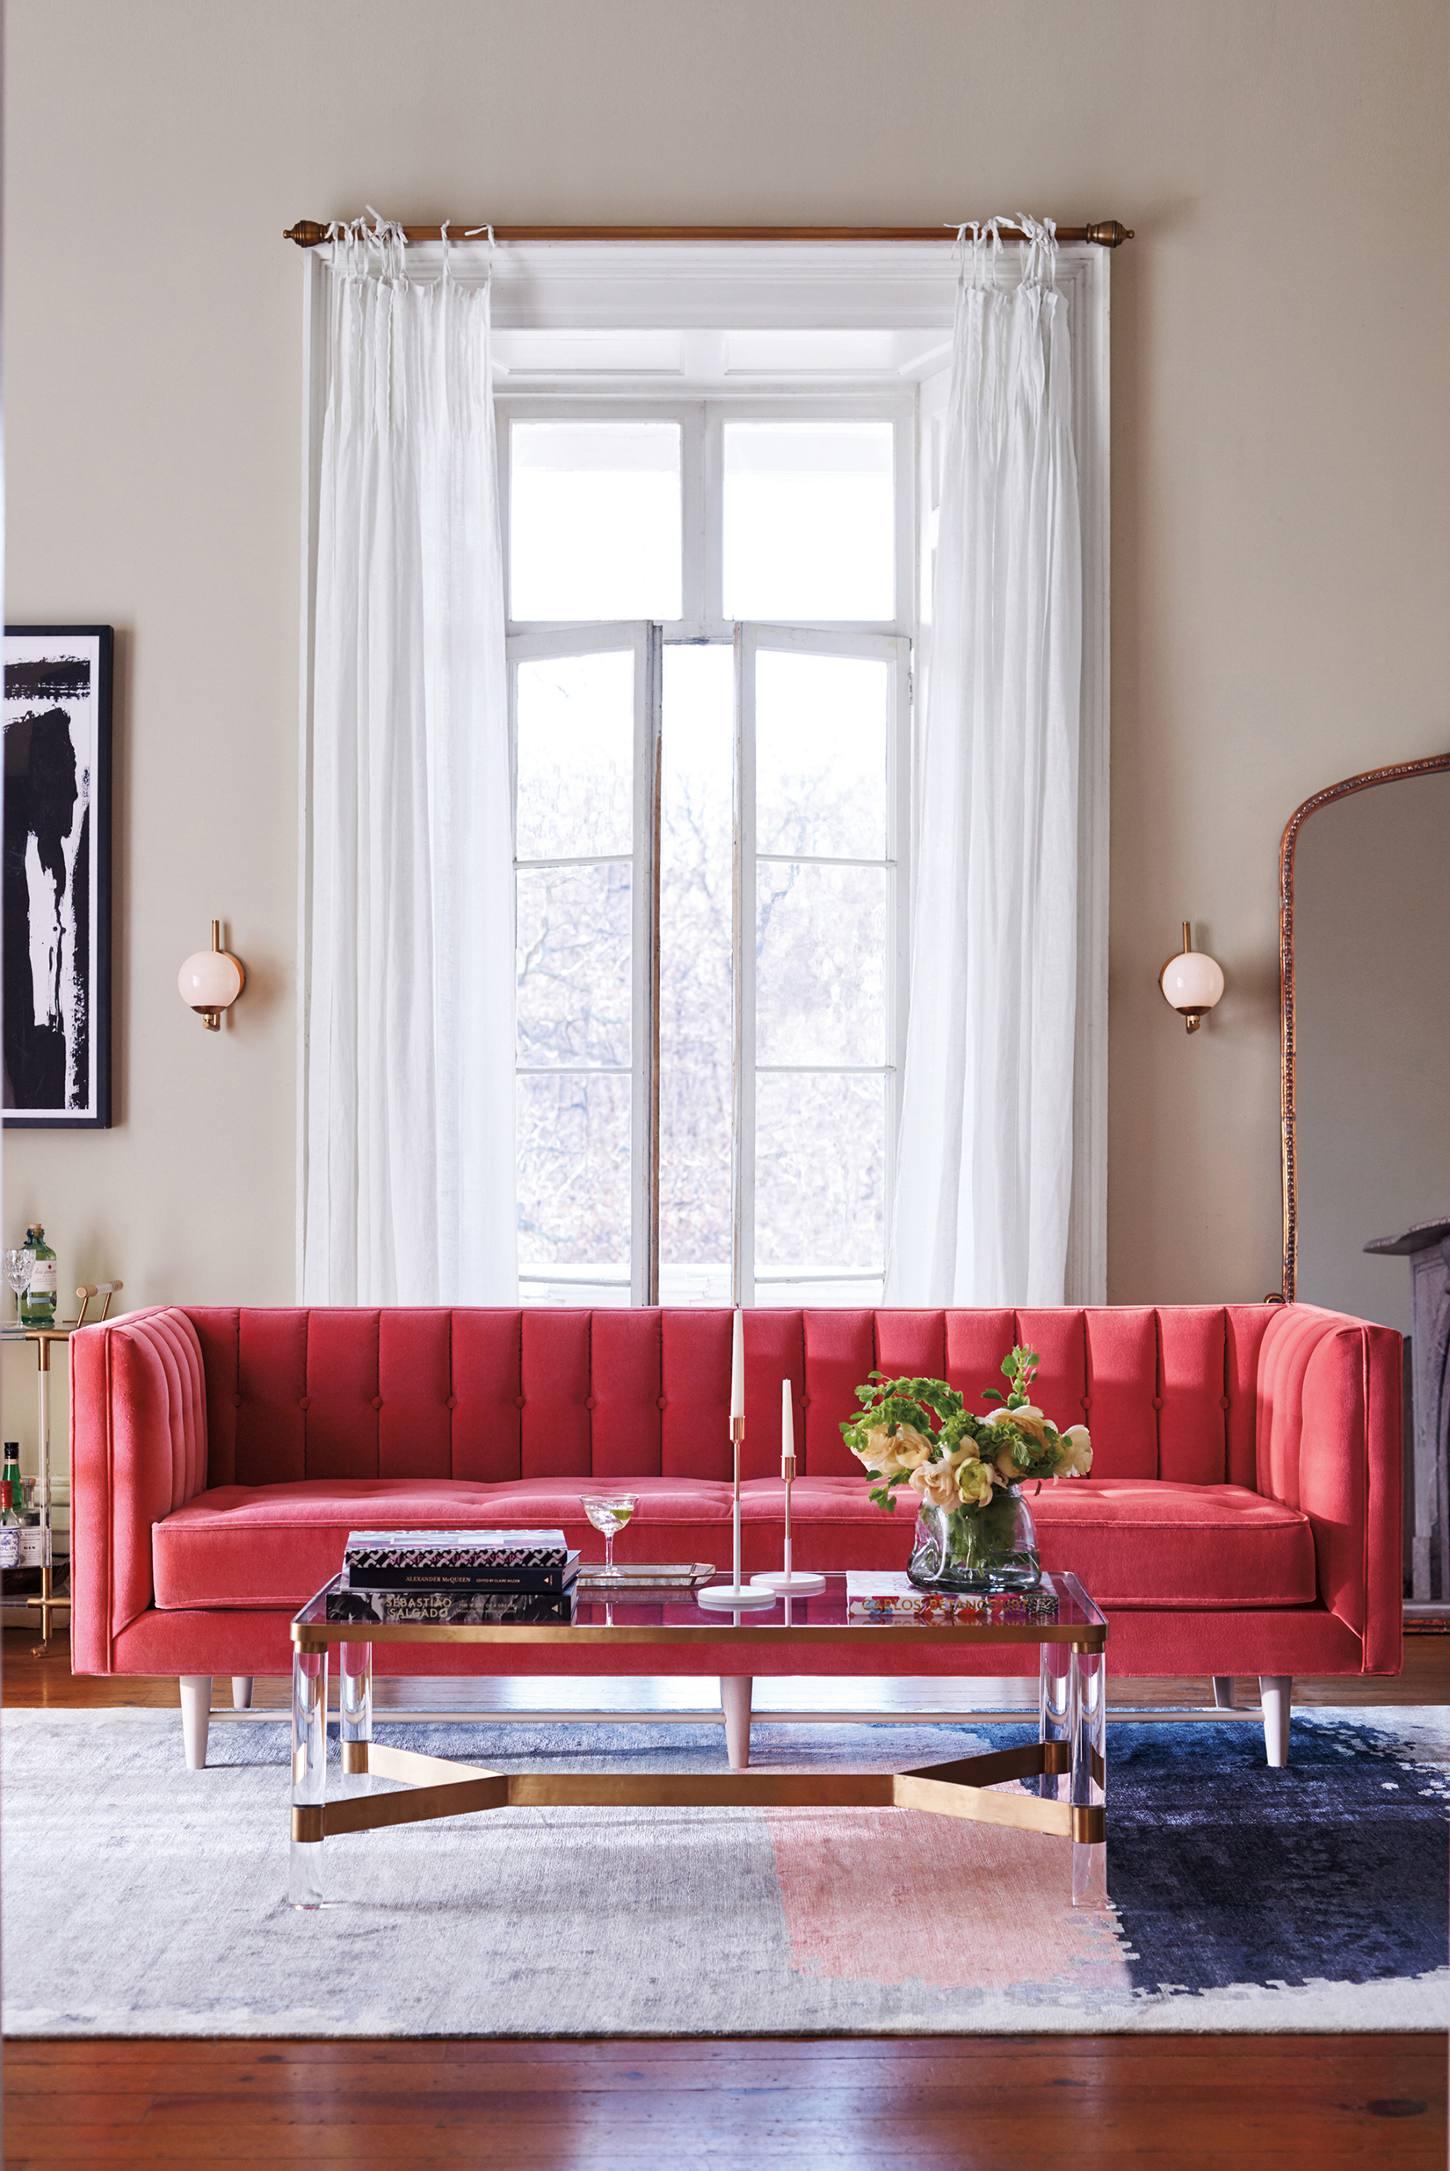 Anthropologie Pink Sofa